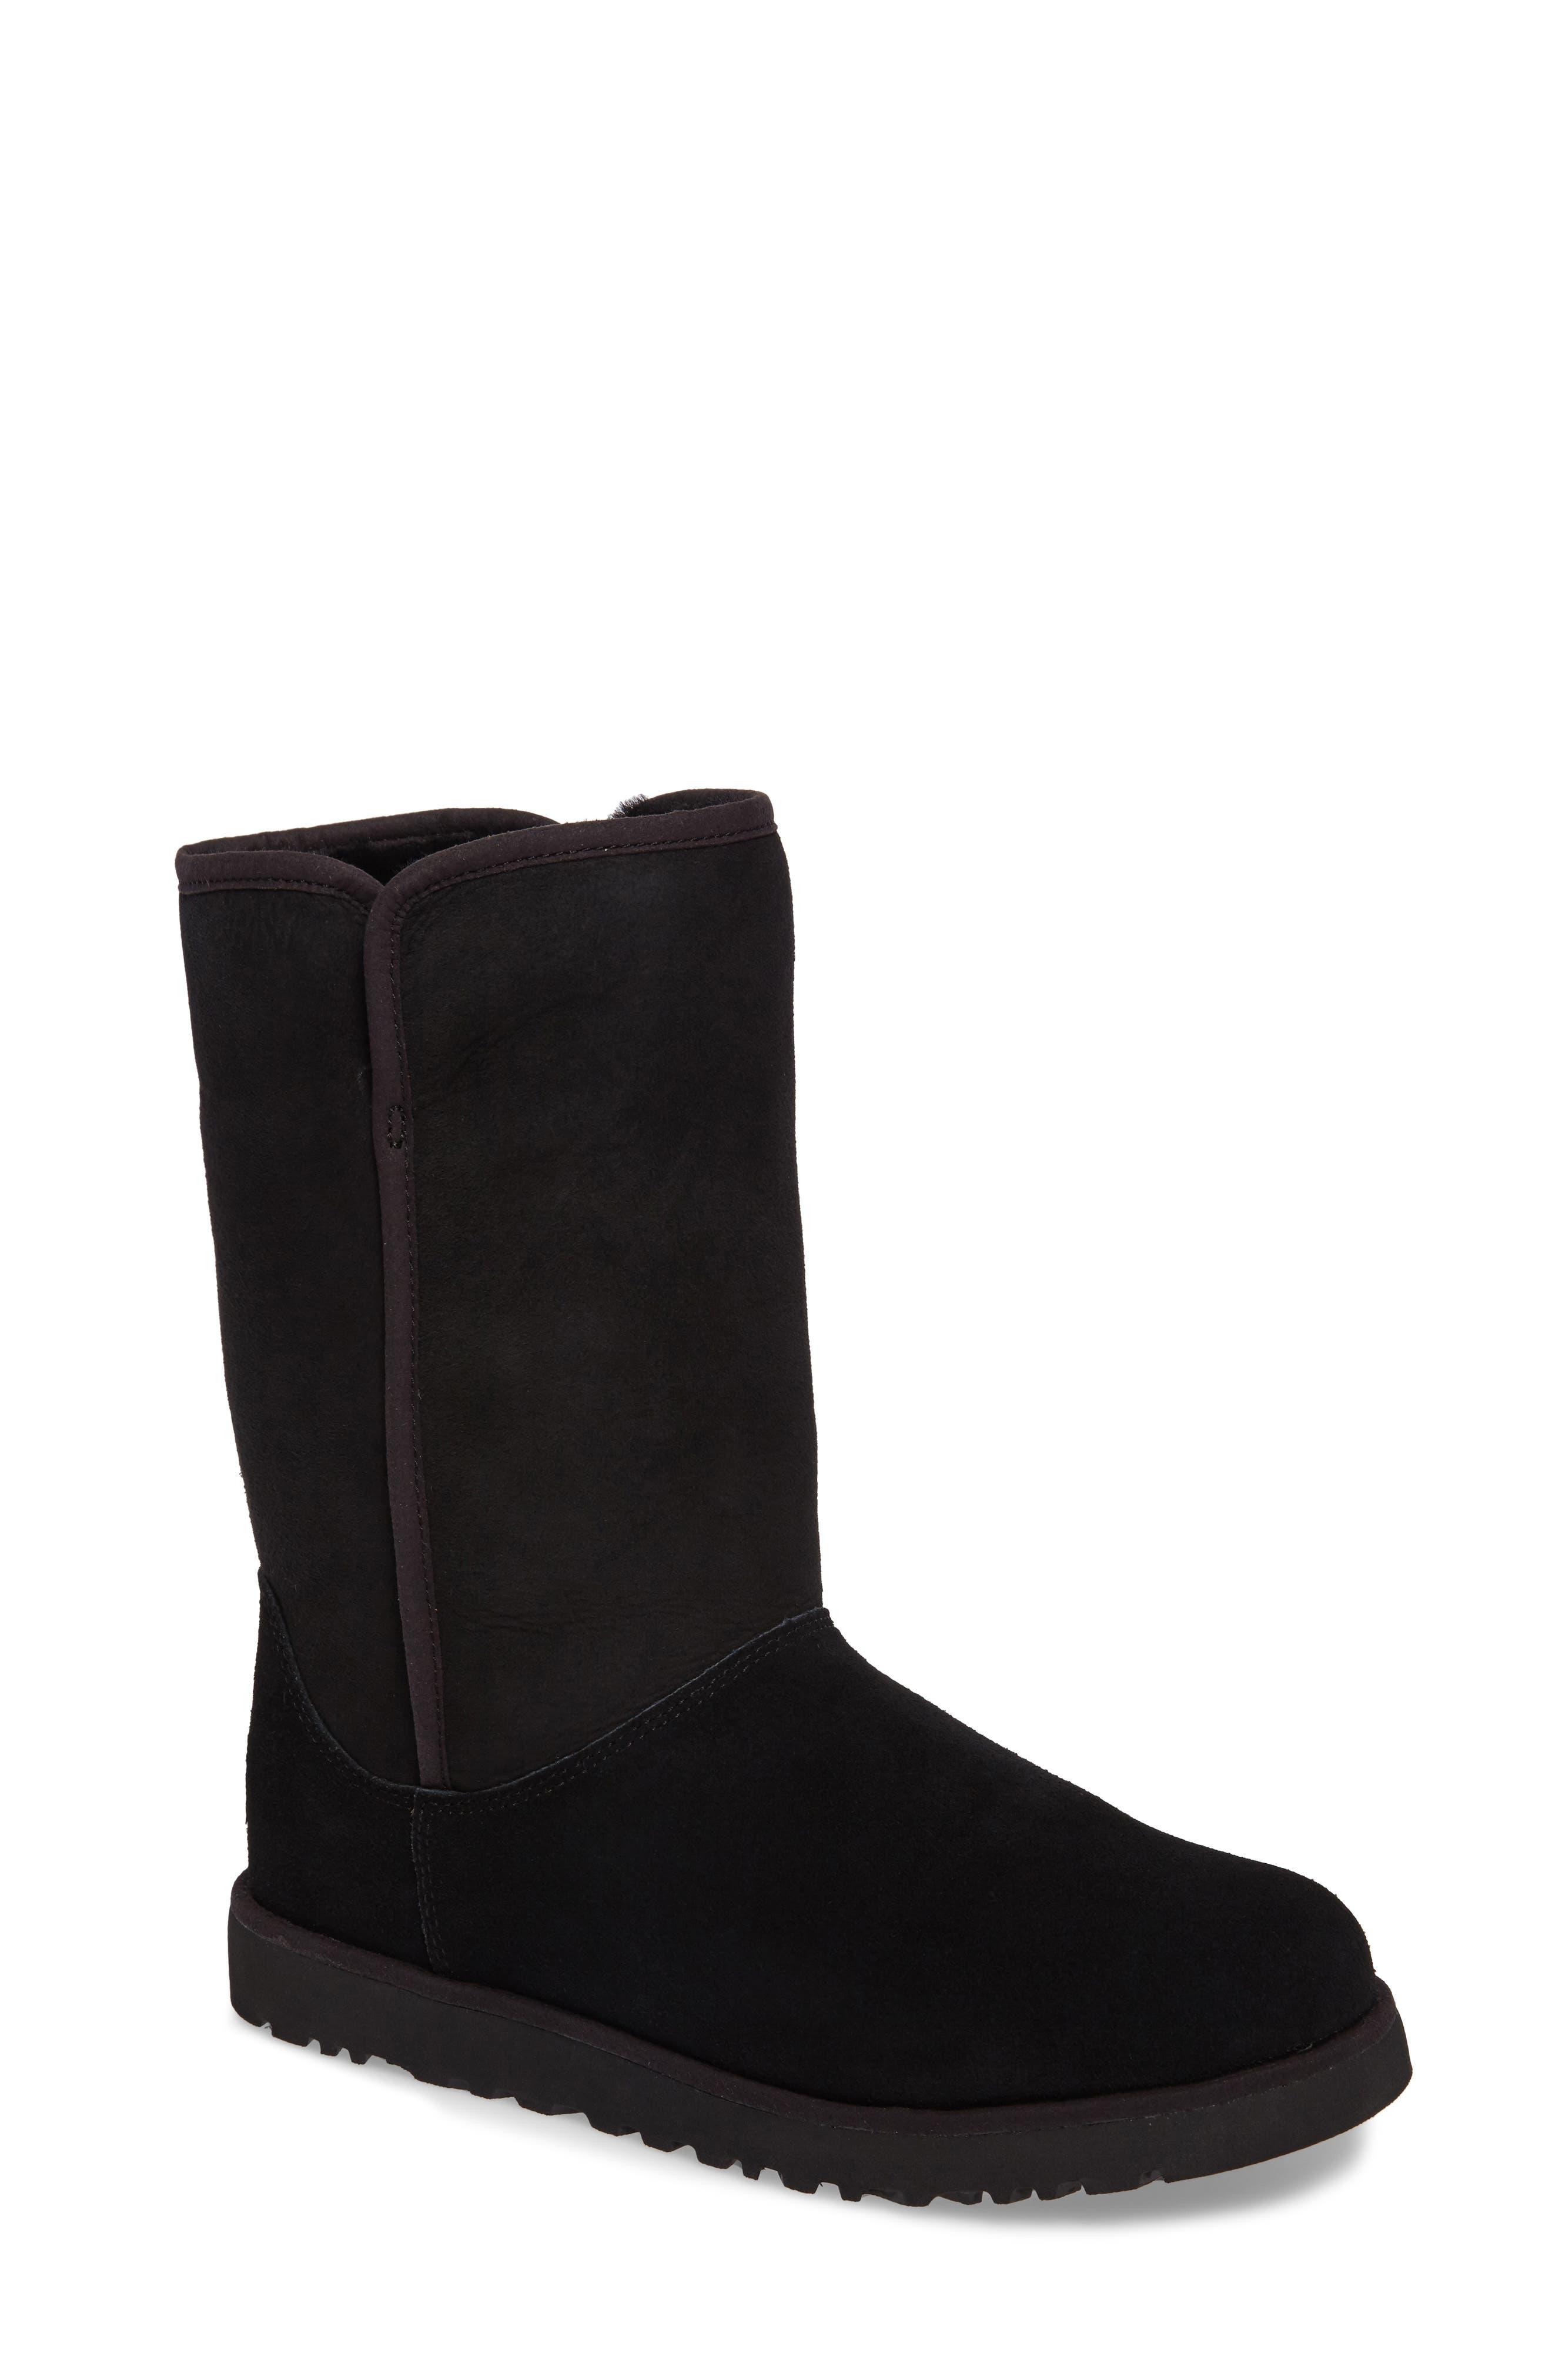 'Michelle' Boot,                         Main,                         color, BLACK SUEDE